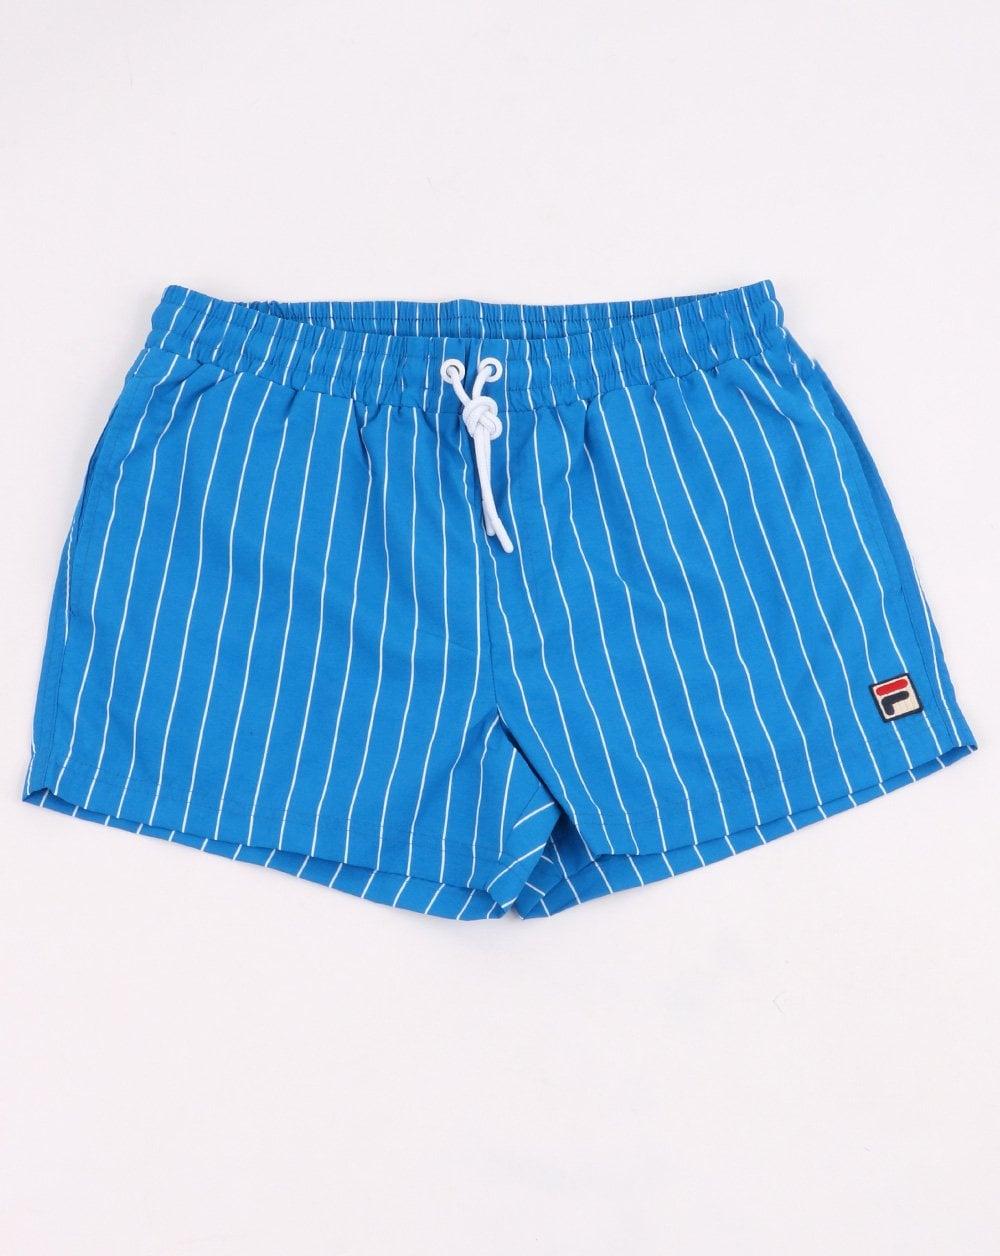 cab6bd97b03b Fila Vintage Pinstripe Swim Shorts Blue| 80s casual classics